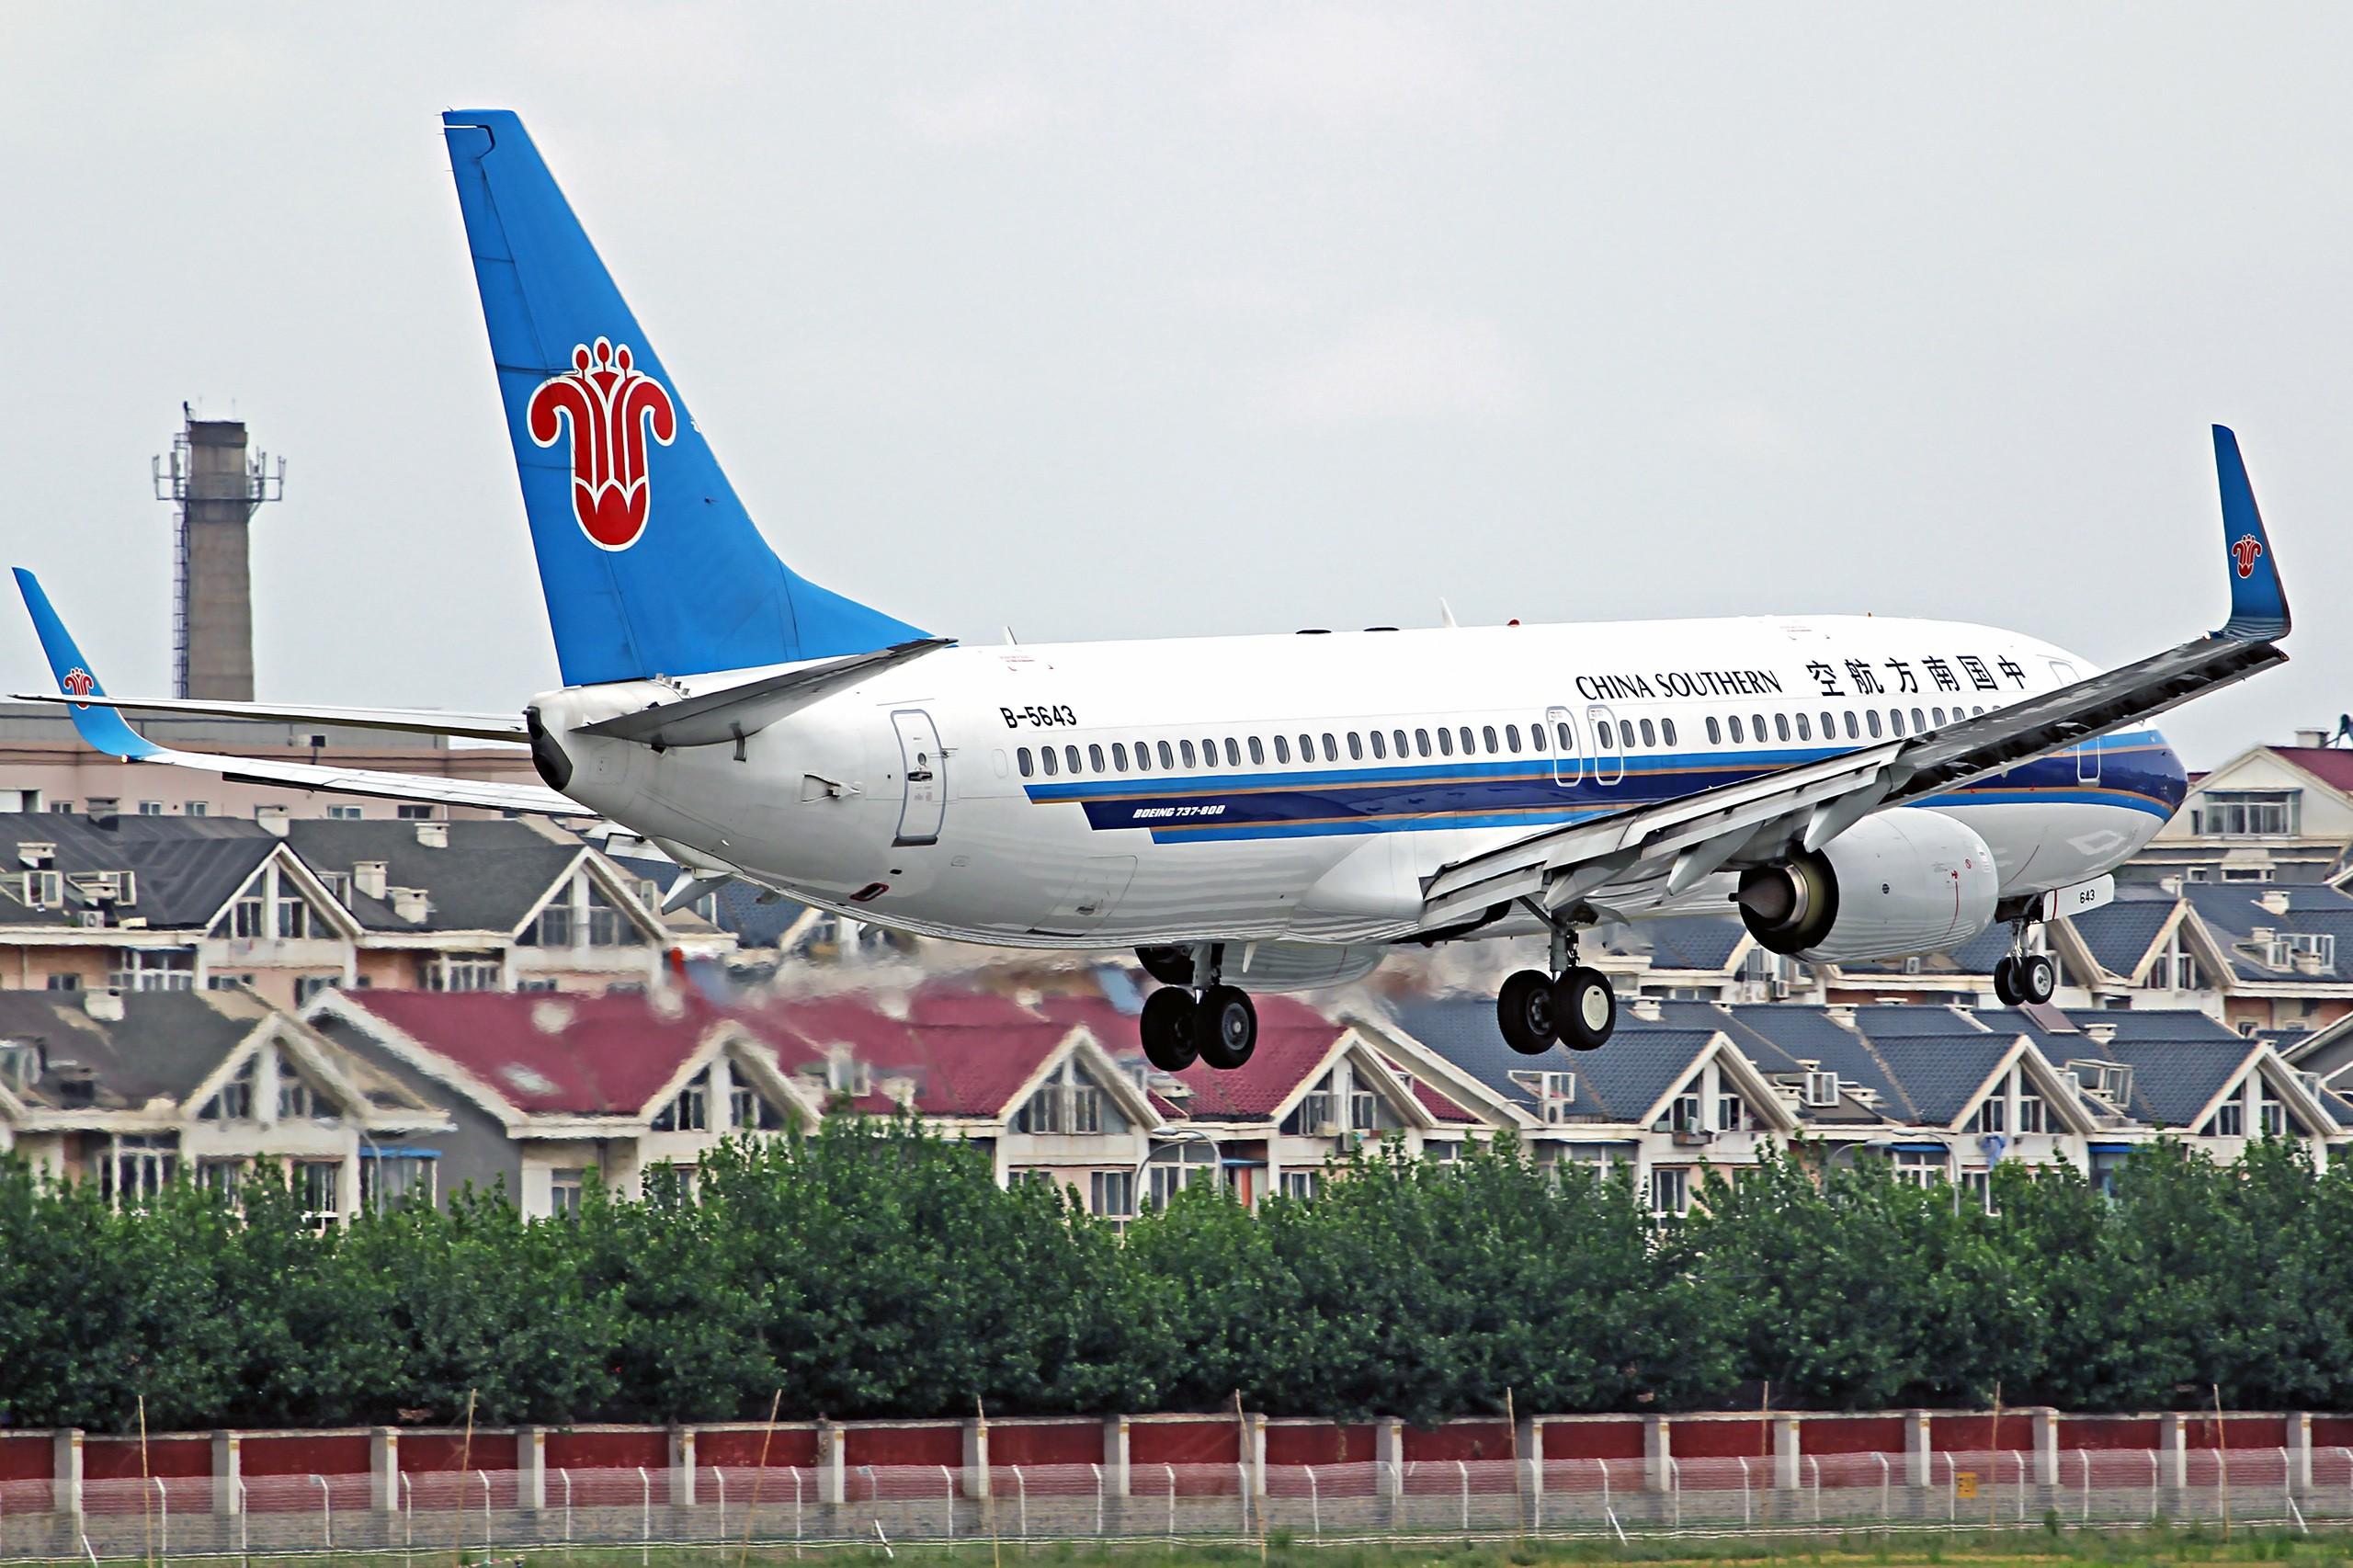 Re:[原创][DLC]...窄体机...2560x1707}Pix BOEING 737-800 B-5643 中国大连周水子国际机场